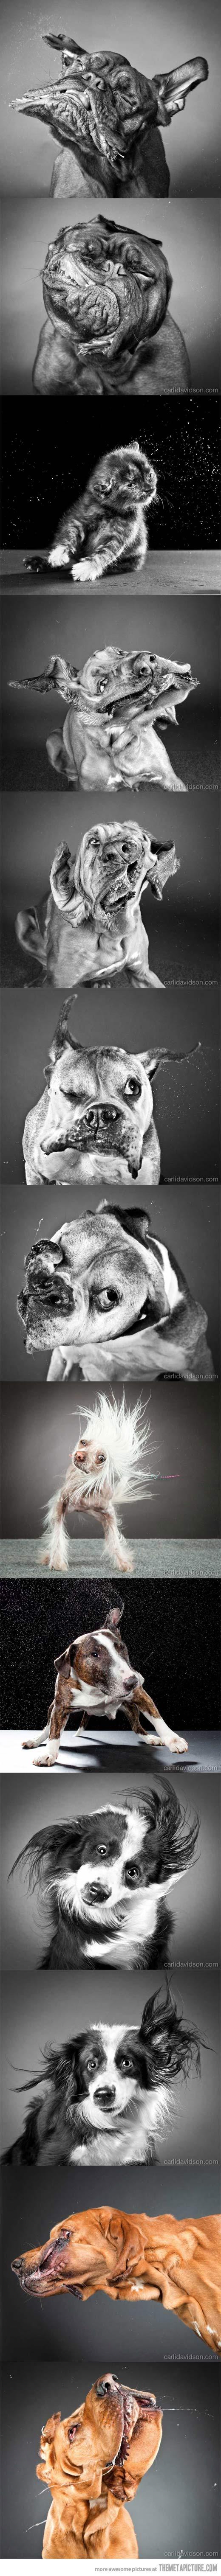 funny-dogs-shake-pics-compilation